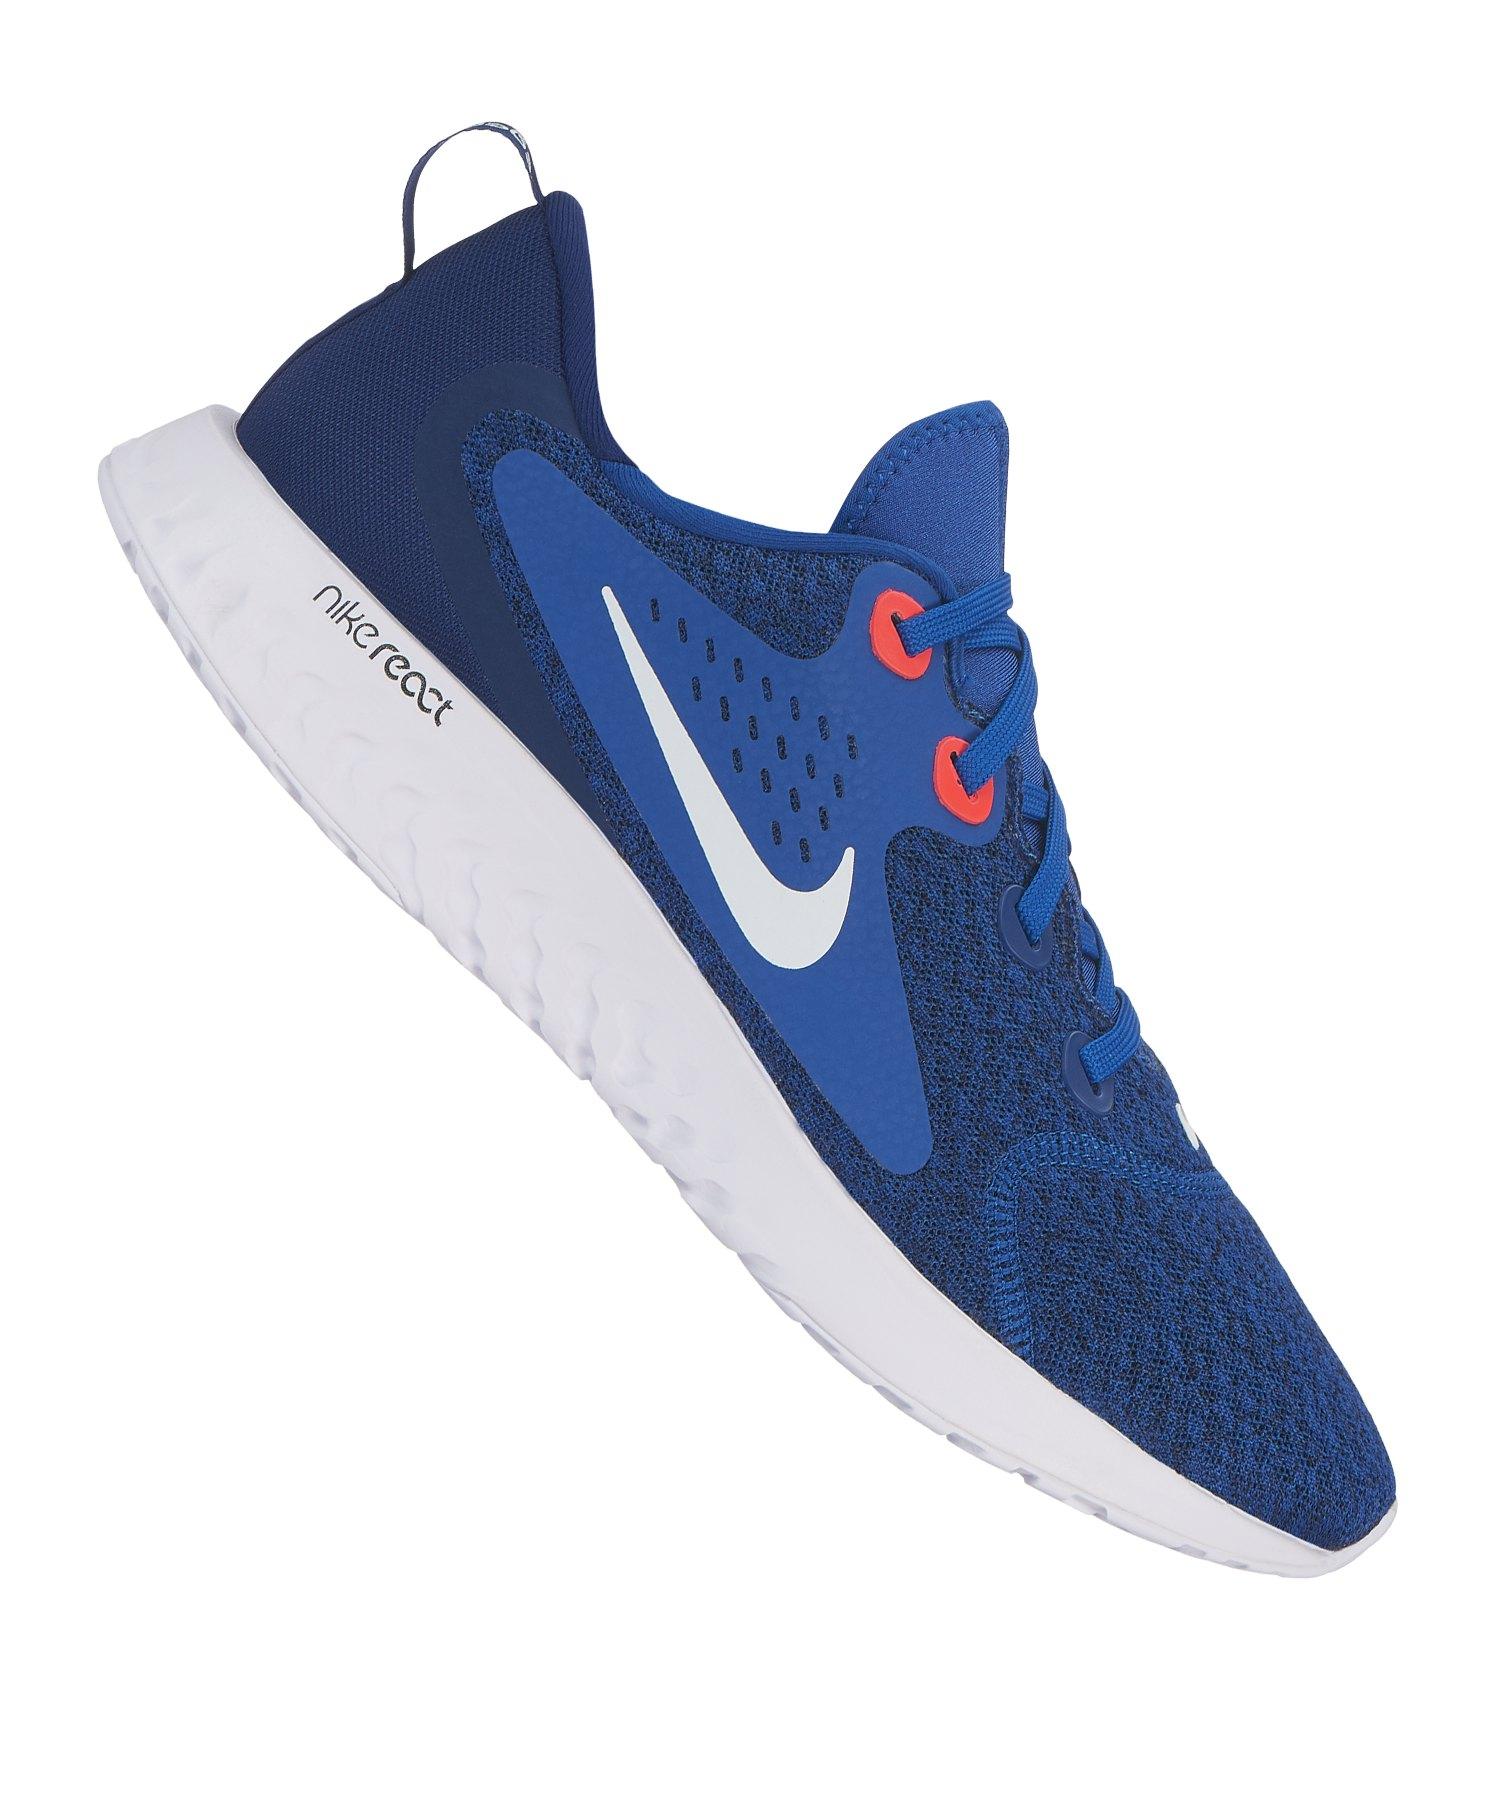 Nike Legend React Running Blau Weiss F405 - blau